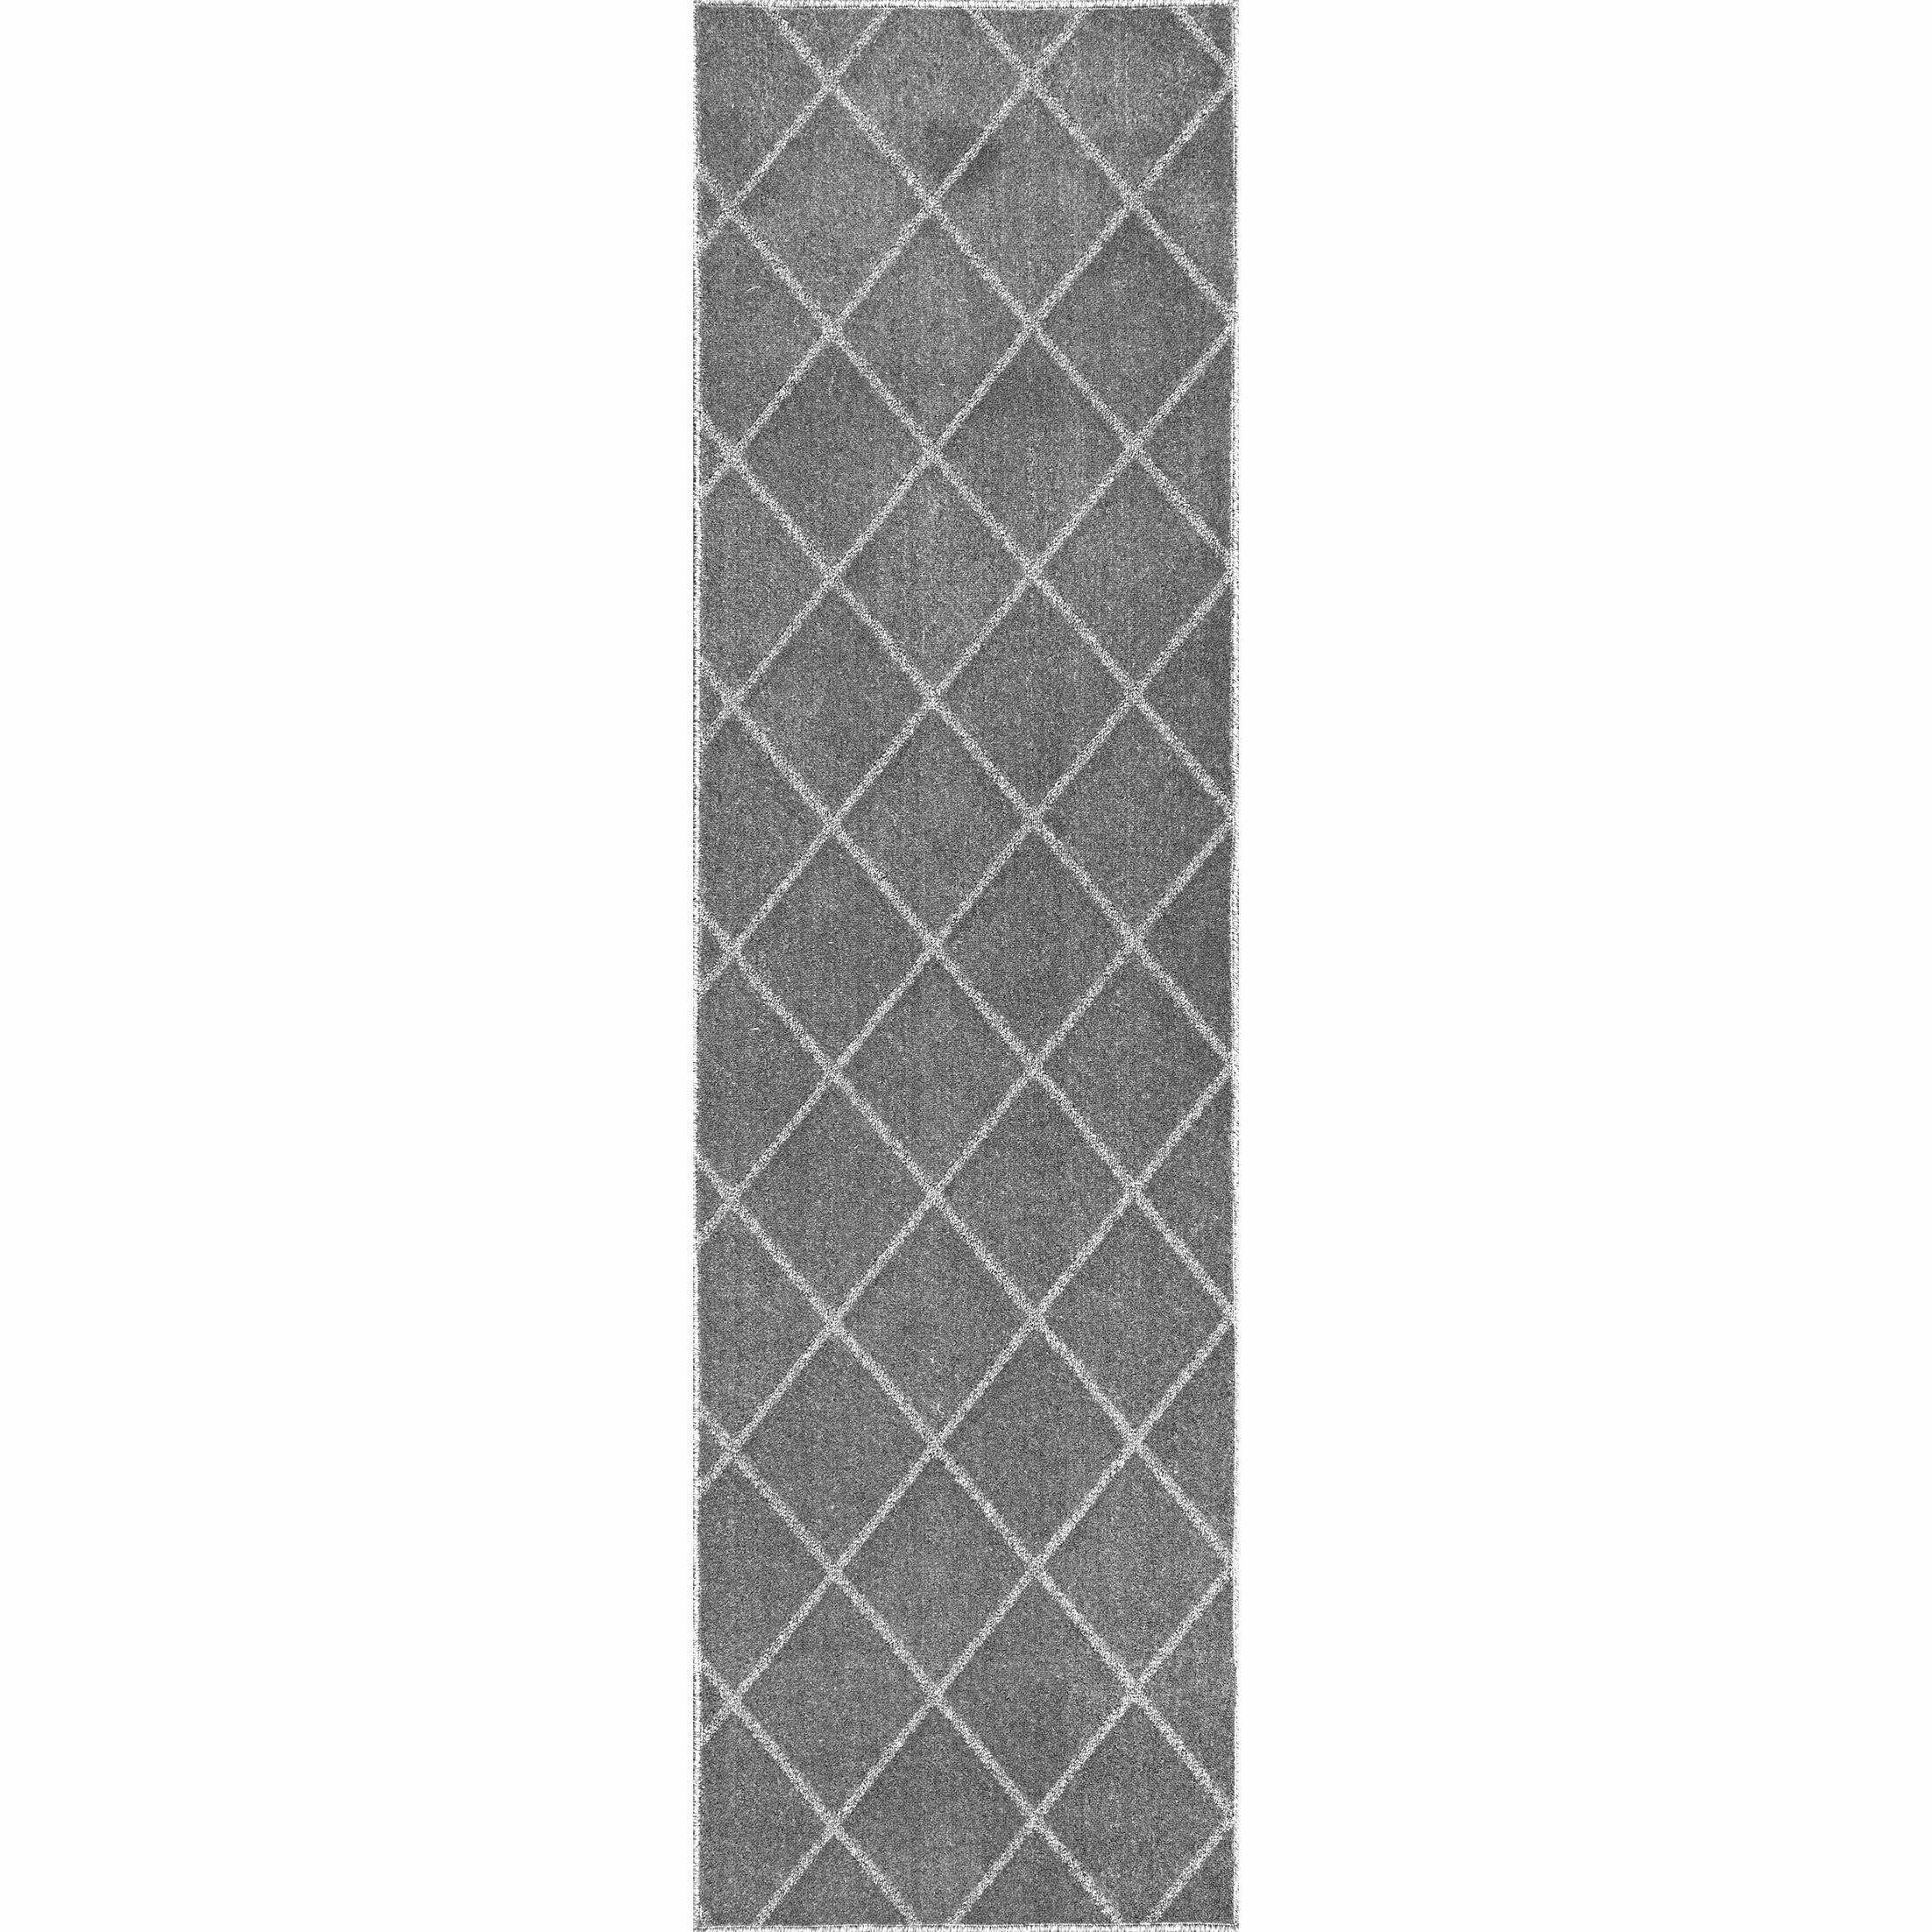 Celestyna Hand-Tufted Gray Area Rug Rug Size: Runner 2'3